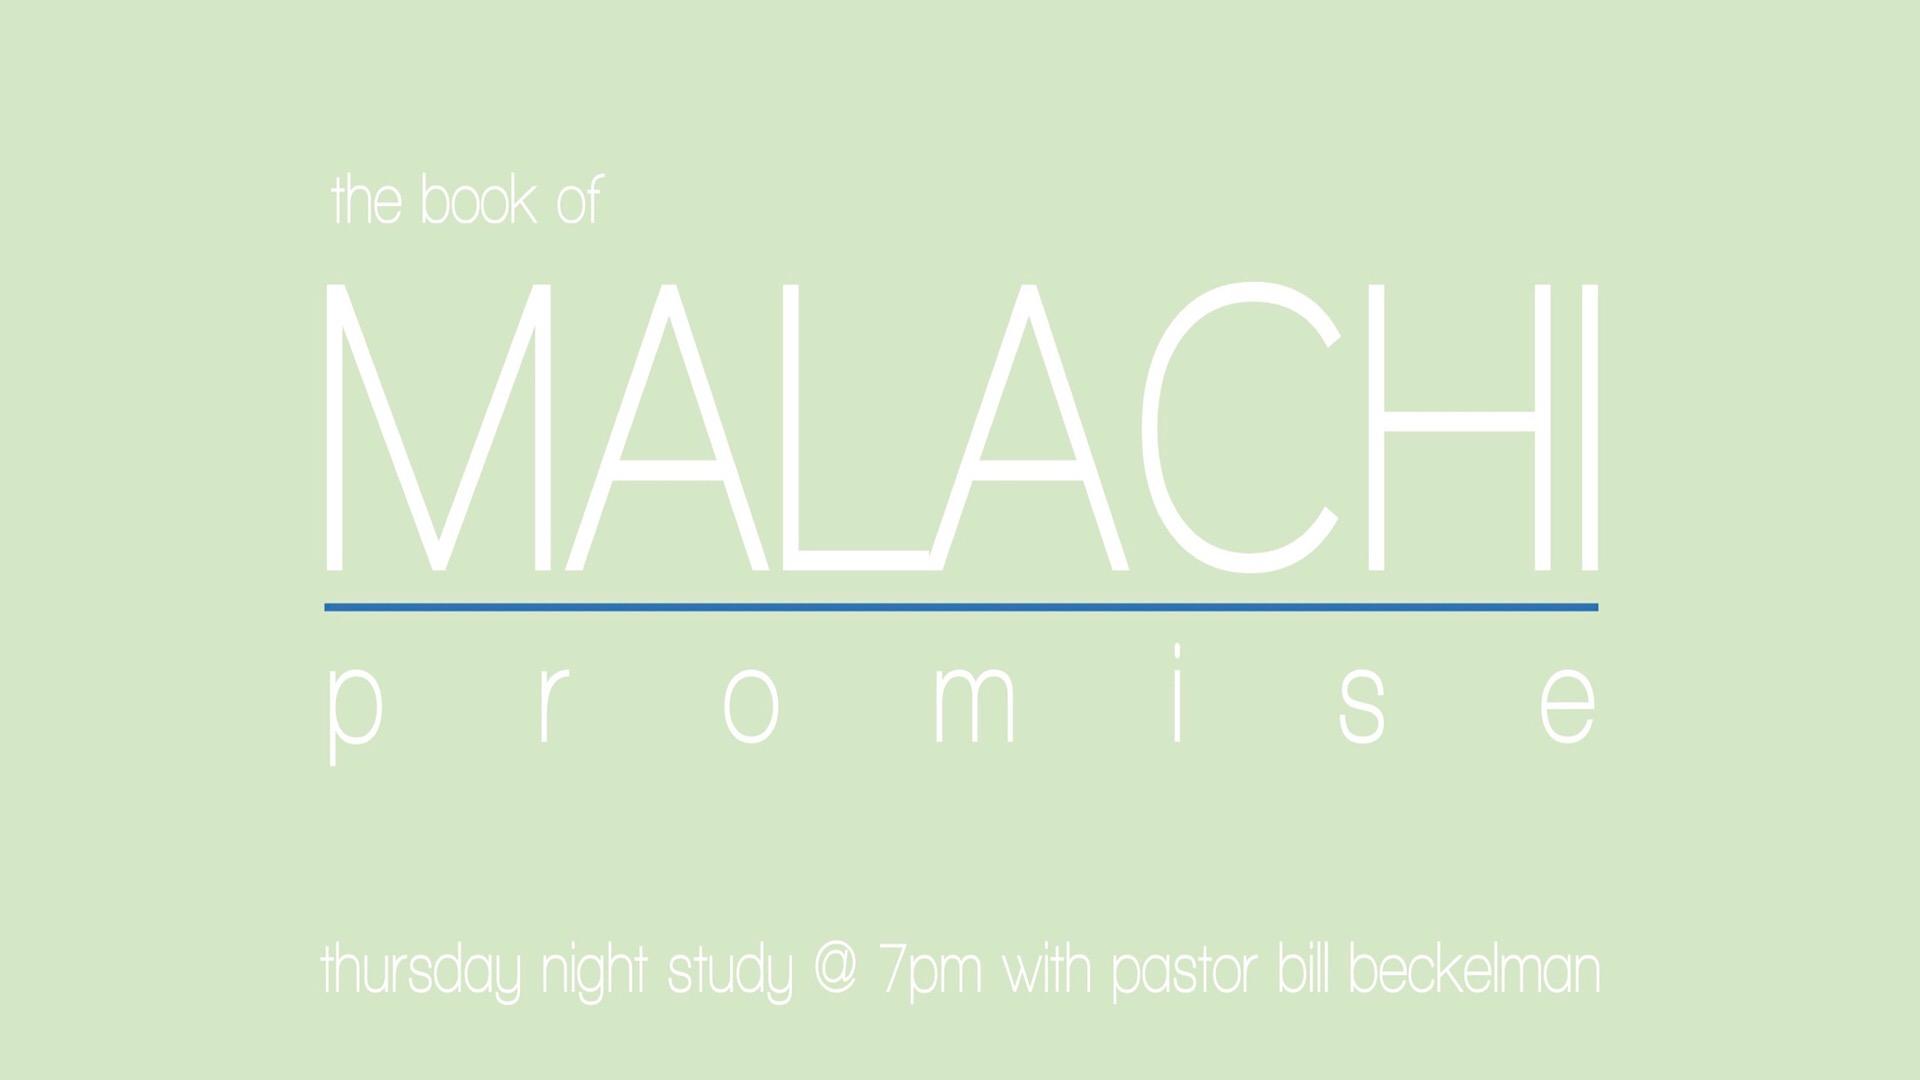 Malachi preslider.JPG